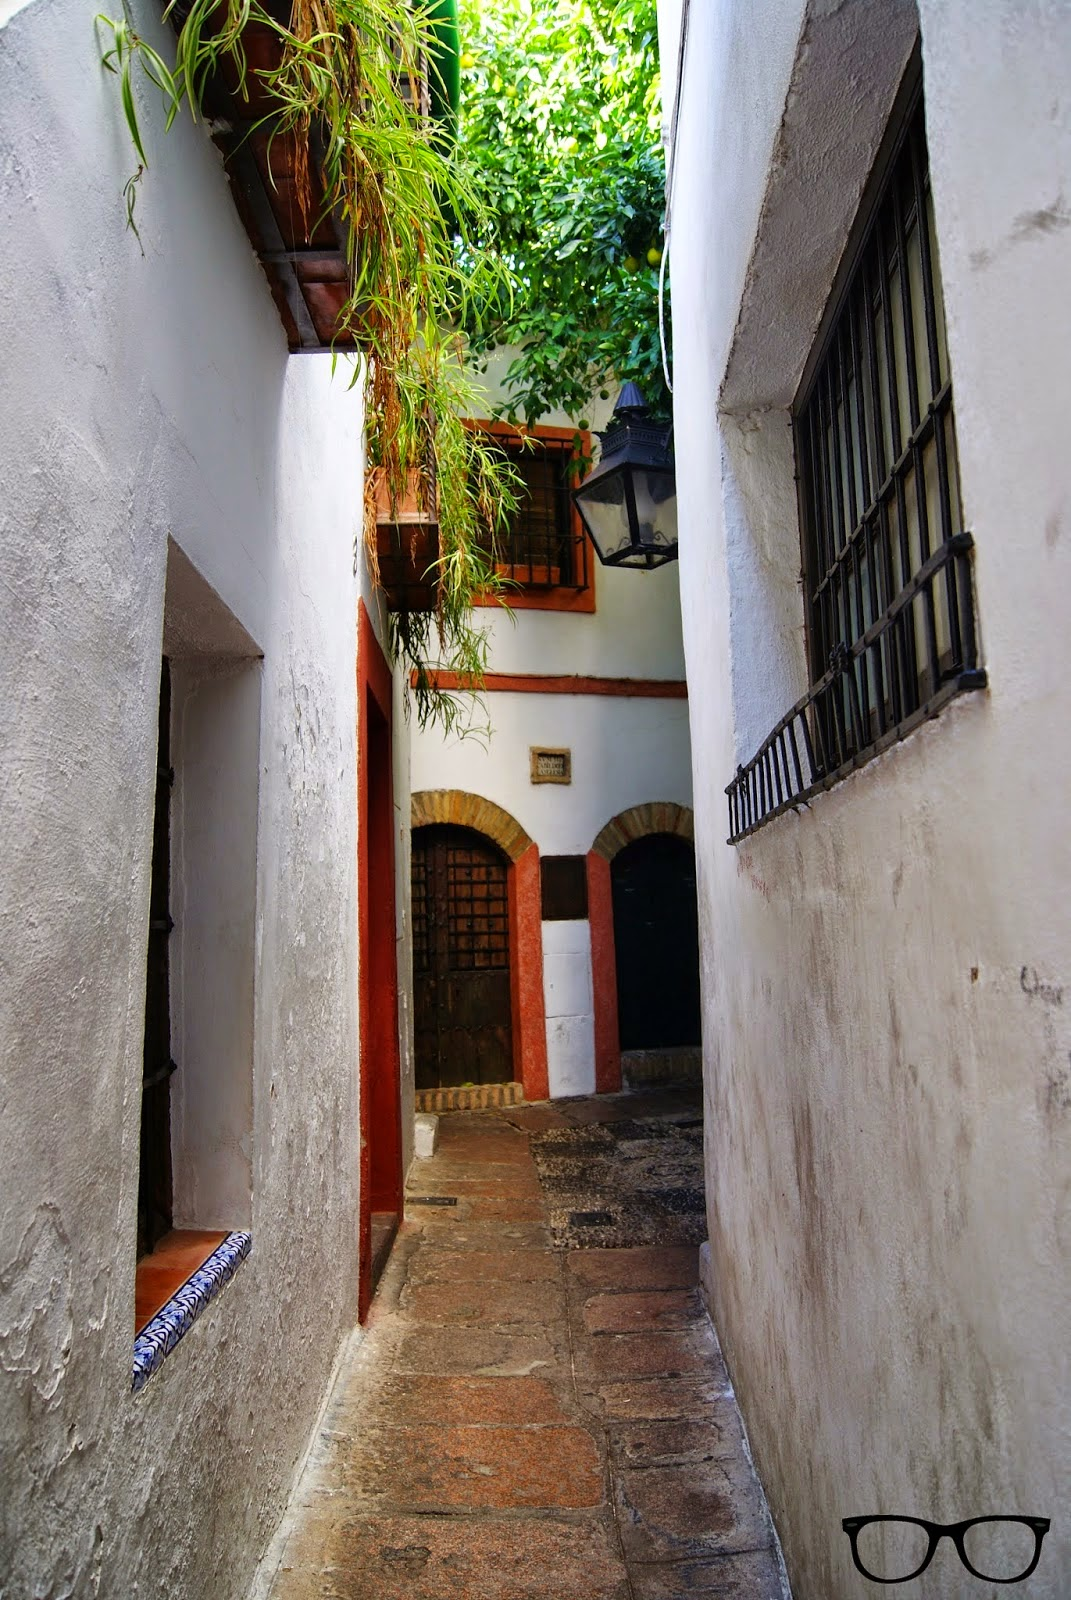 Calle del pañuelo